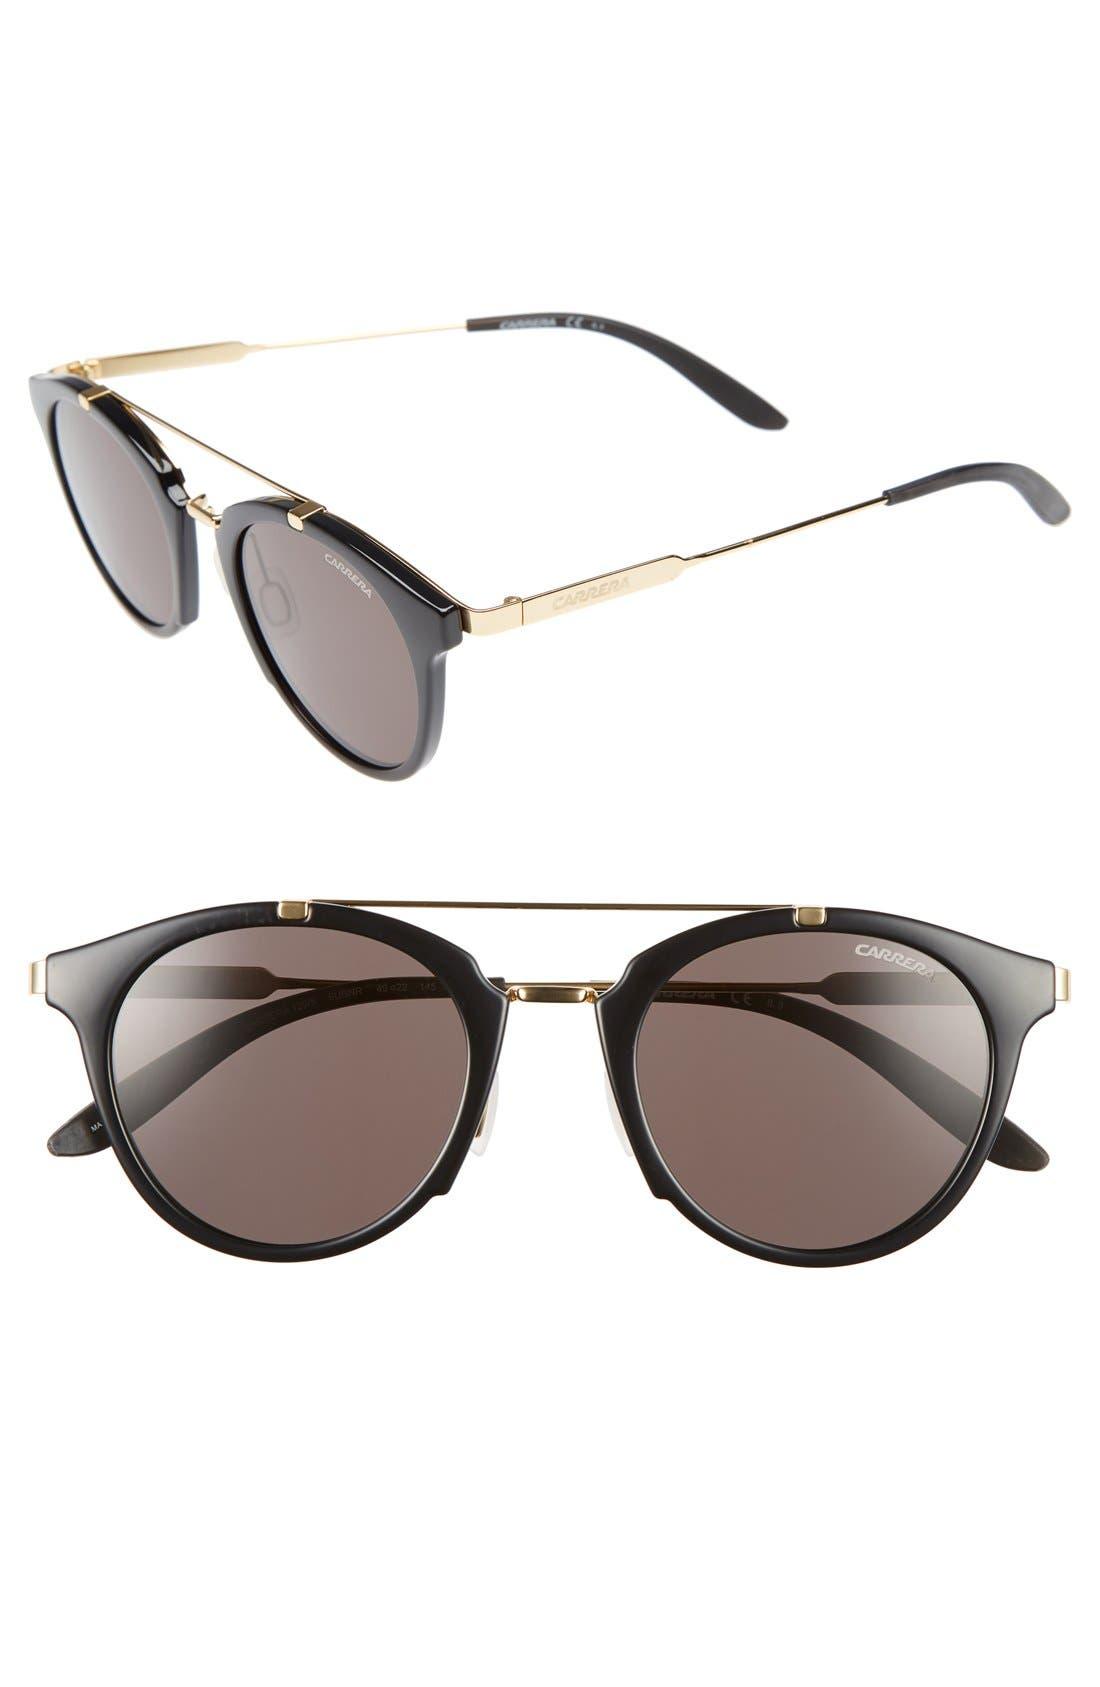 Carrera 126 49mm Sunglasses,                             Main thumbnail 1, color,                             001